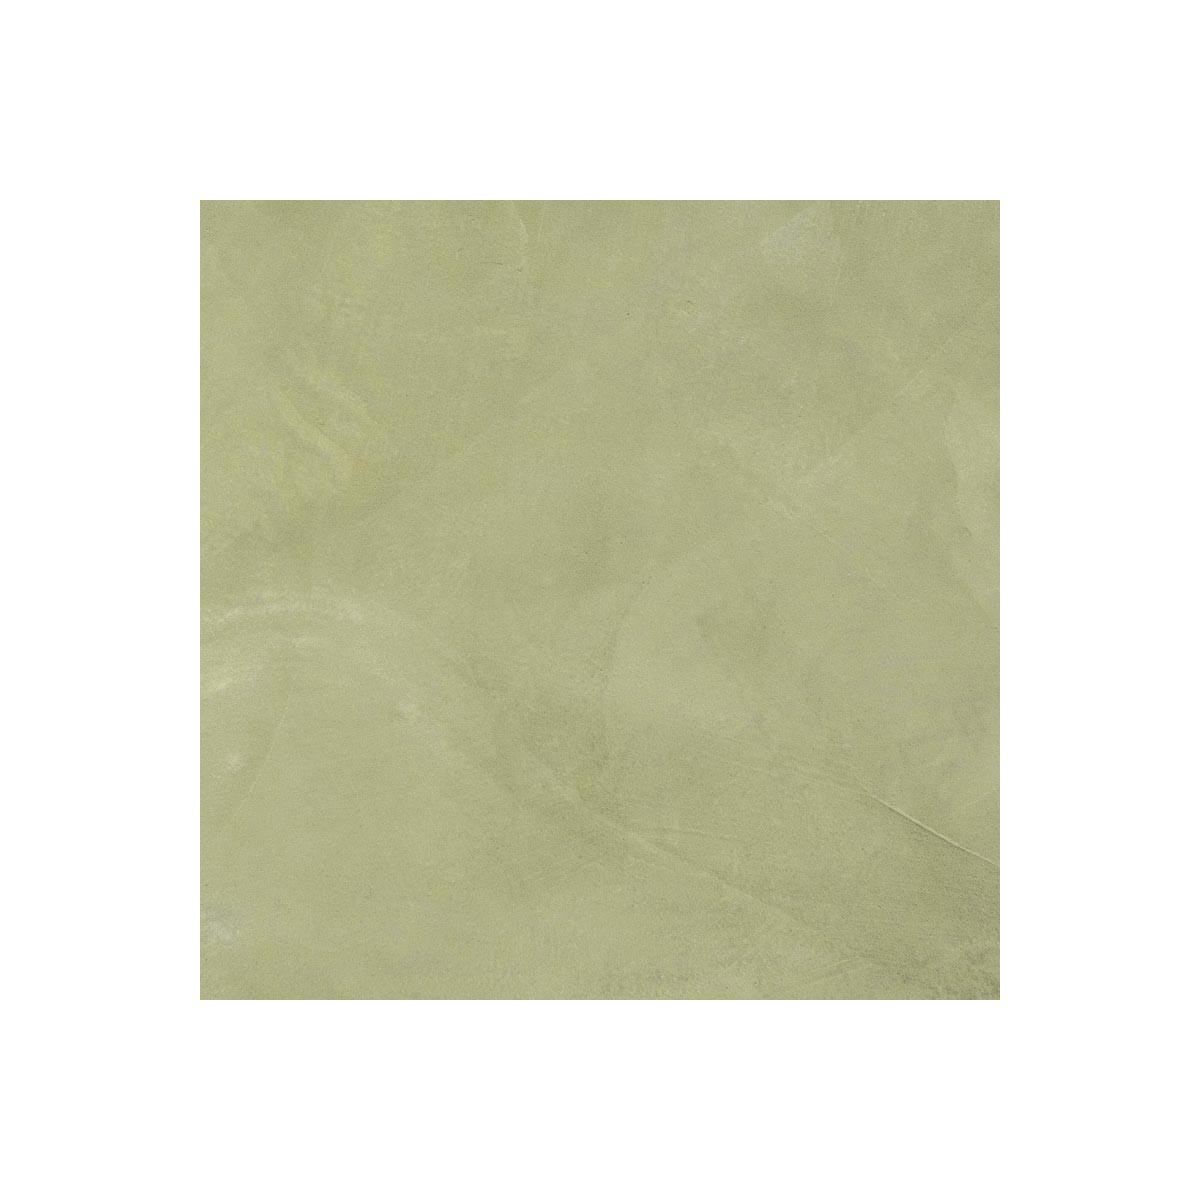 B ton cir sol passage courant et mur - Mur beton cire ...